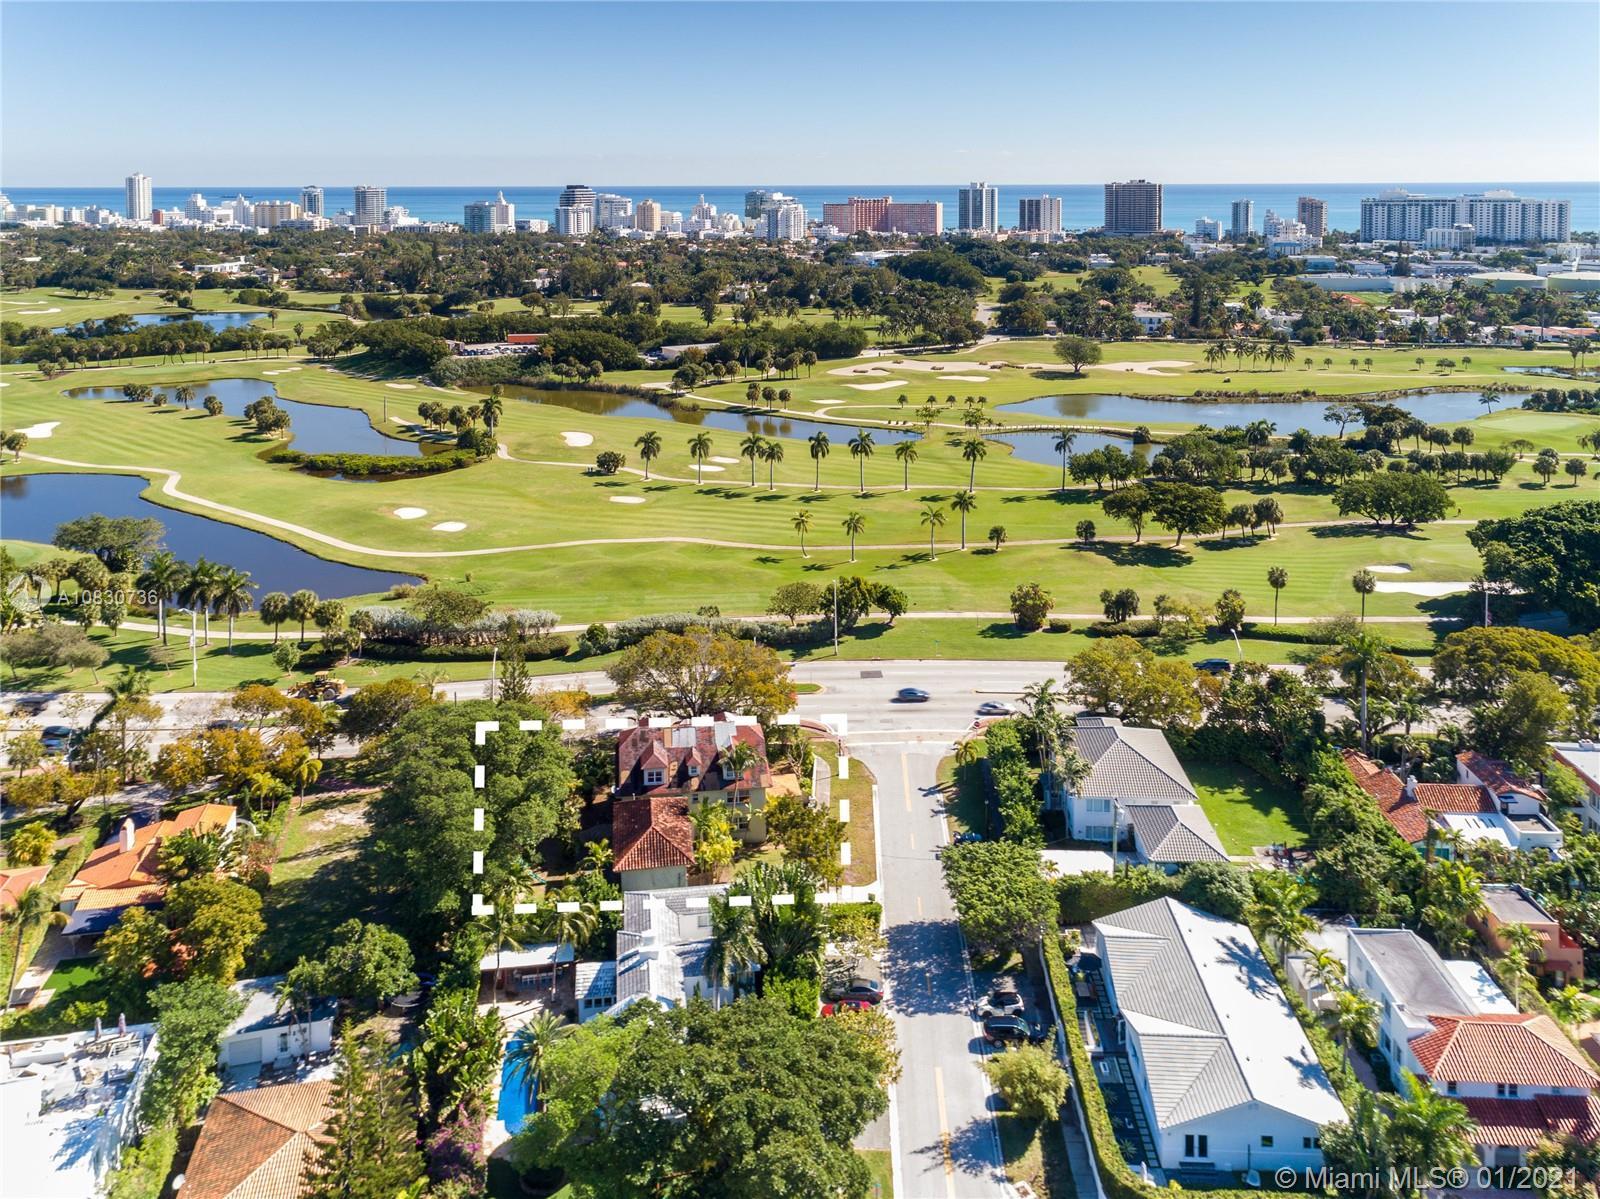 2702 Alton Rd, Miami Beach, FL 33140